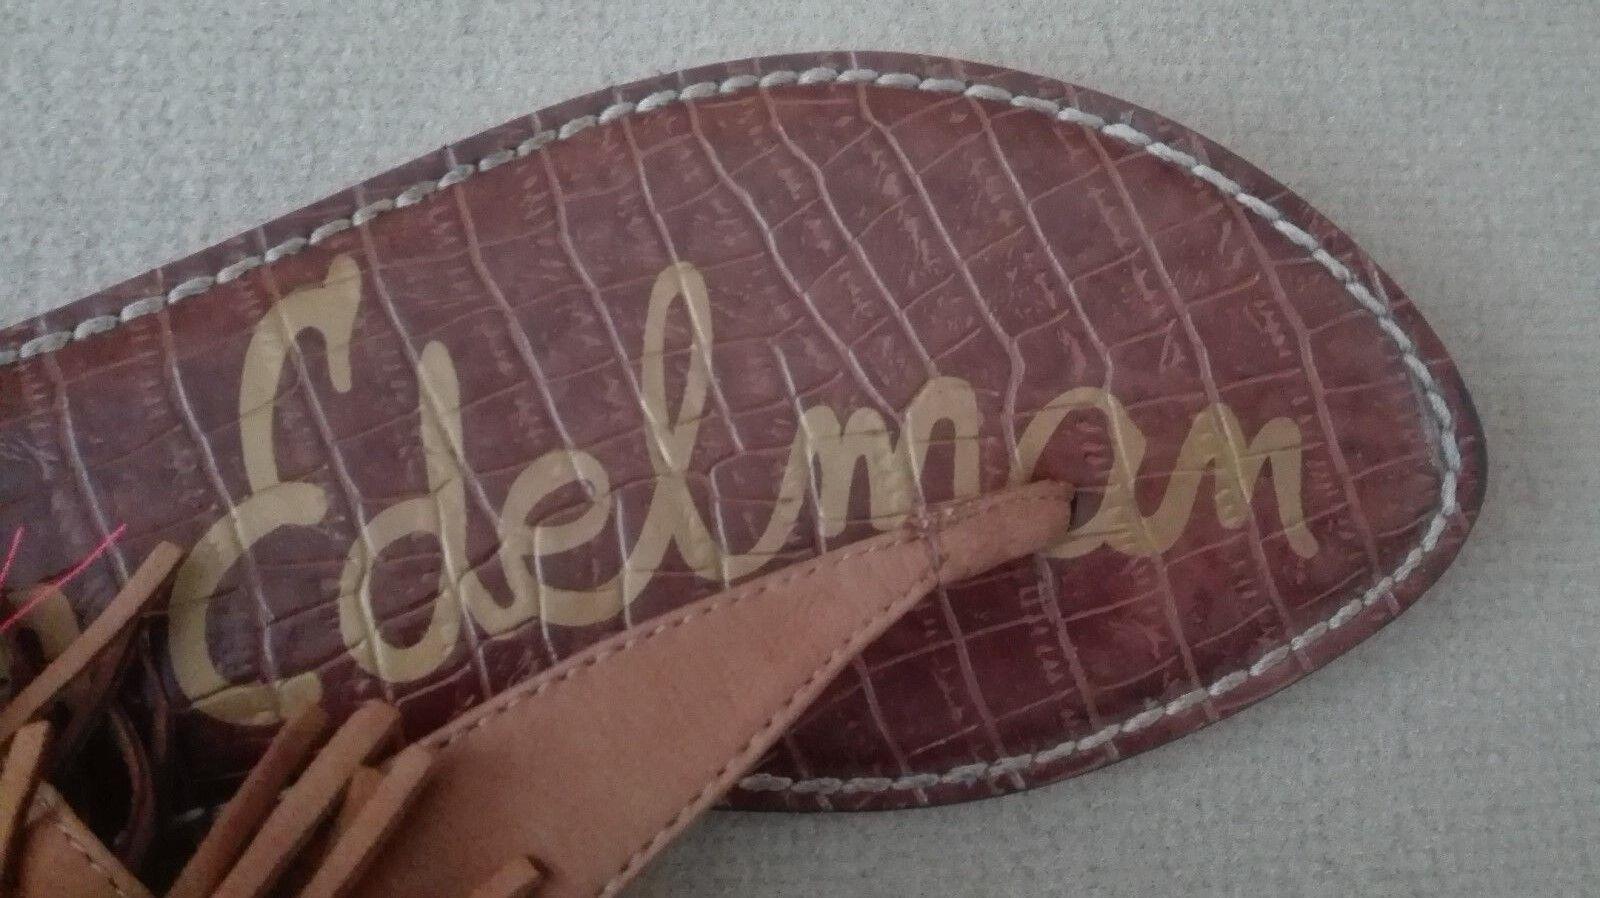 Damen Sandale SAM EDELMANN, Gr. 38,5, bunt, flach, Sommer, Leder, fröhlich